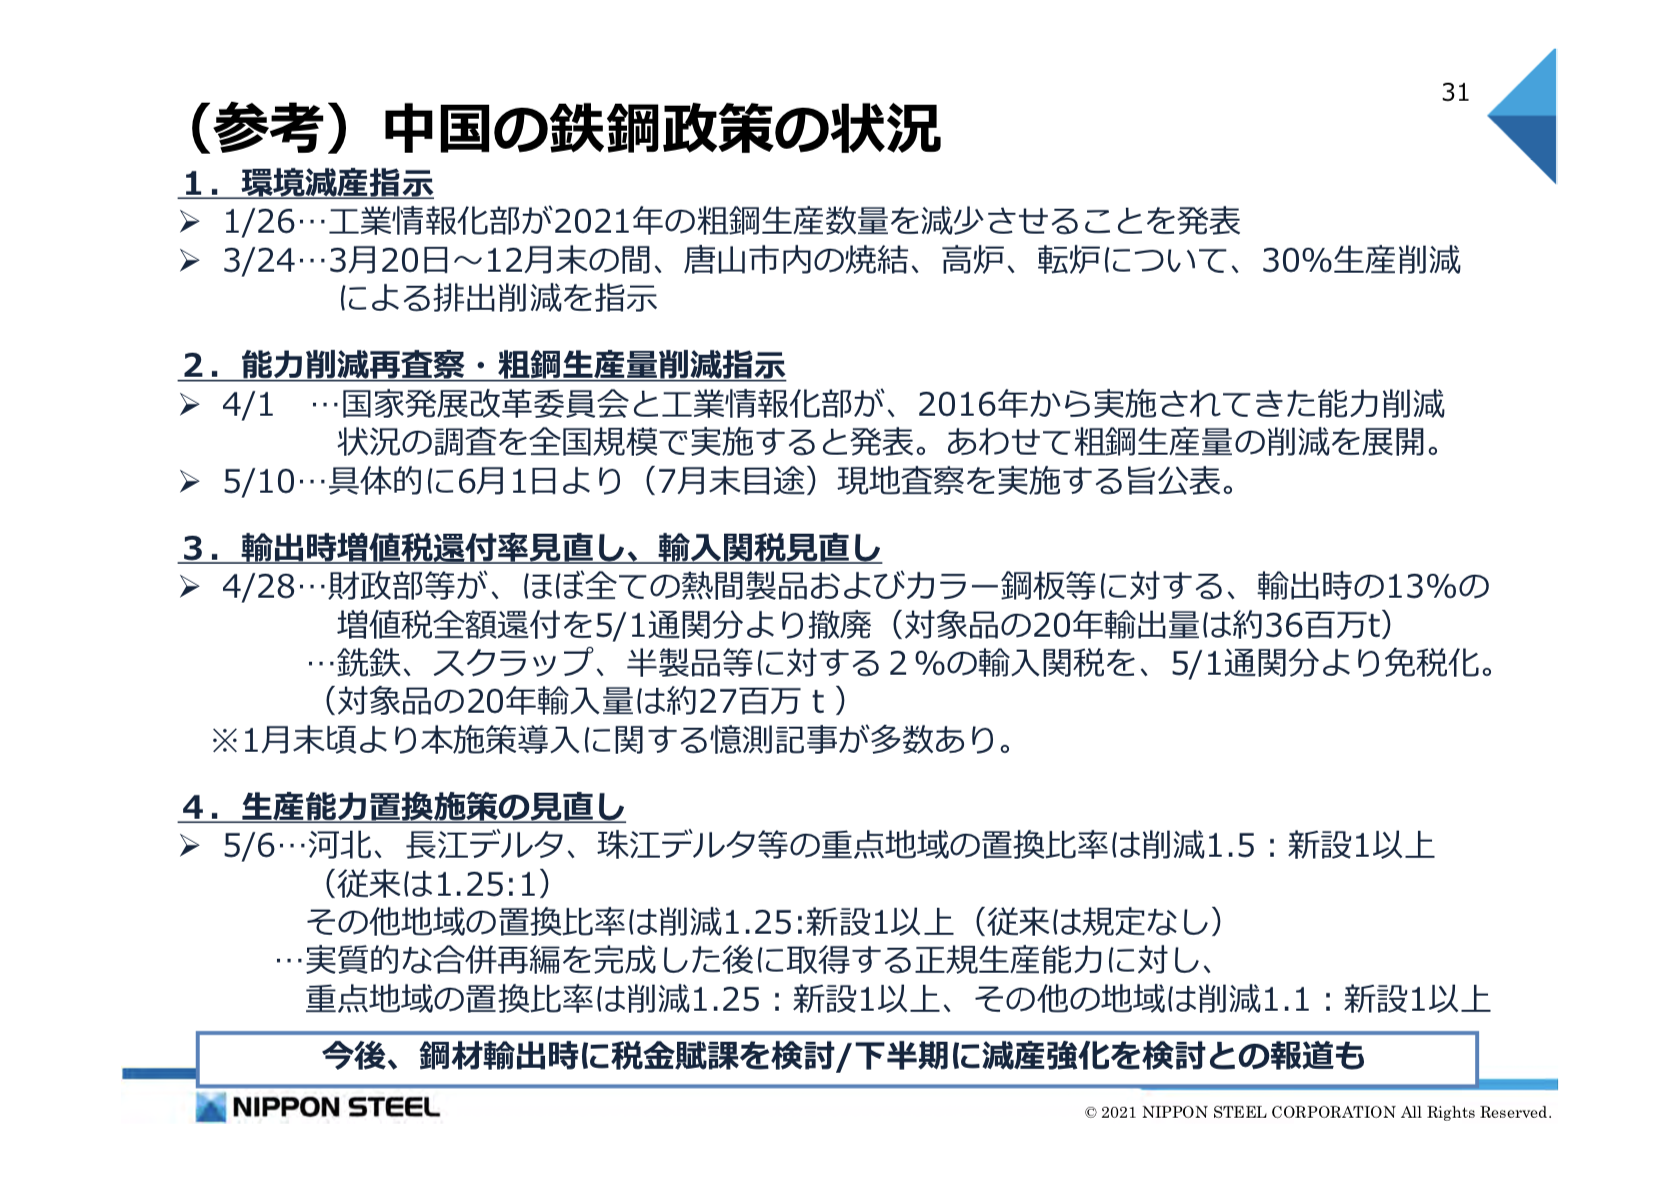 日本製鉄 2021年度1Q決算を徹底解説! さとり世代の株日記 資産運用 株 投資 資産形成 株式投資